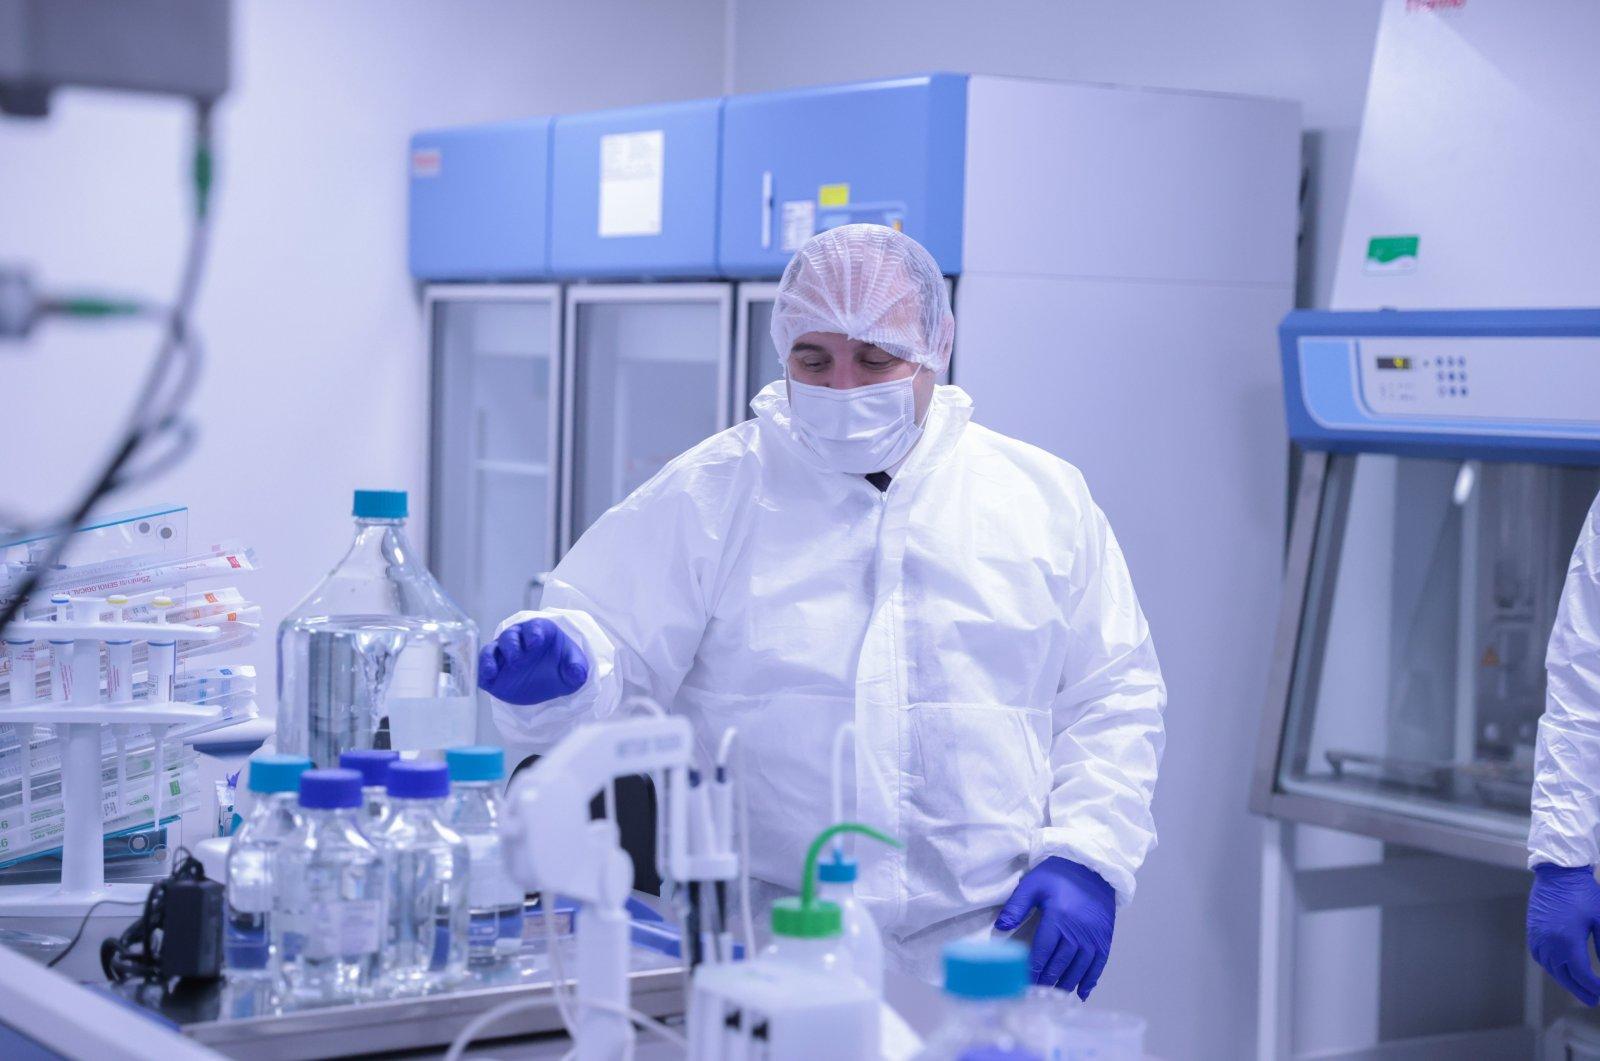 Industry and Technology Minister Mustafa Varank inspects laboratory equipment at Nobel Pharmaceutical's biotechnological medicine facilities in Istanbul, Turkey, Jan. 10, 2021. (IHA Photo)